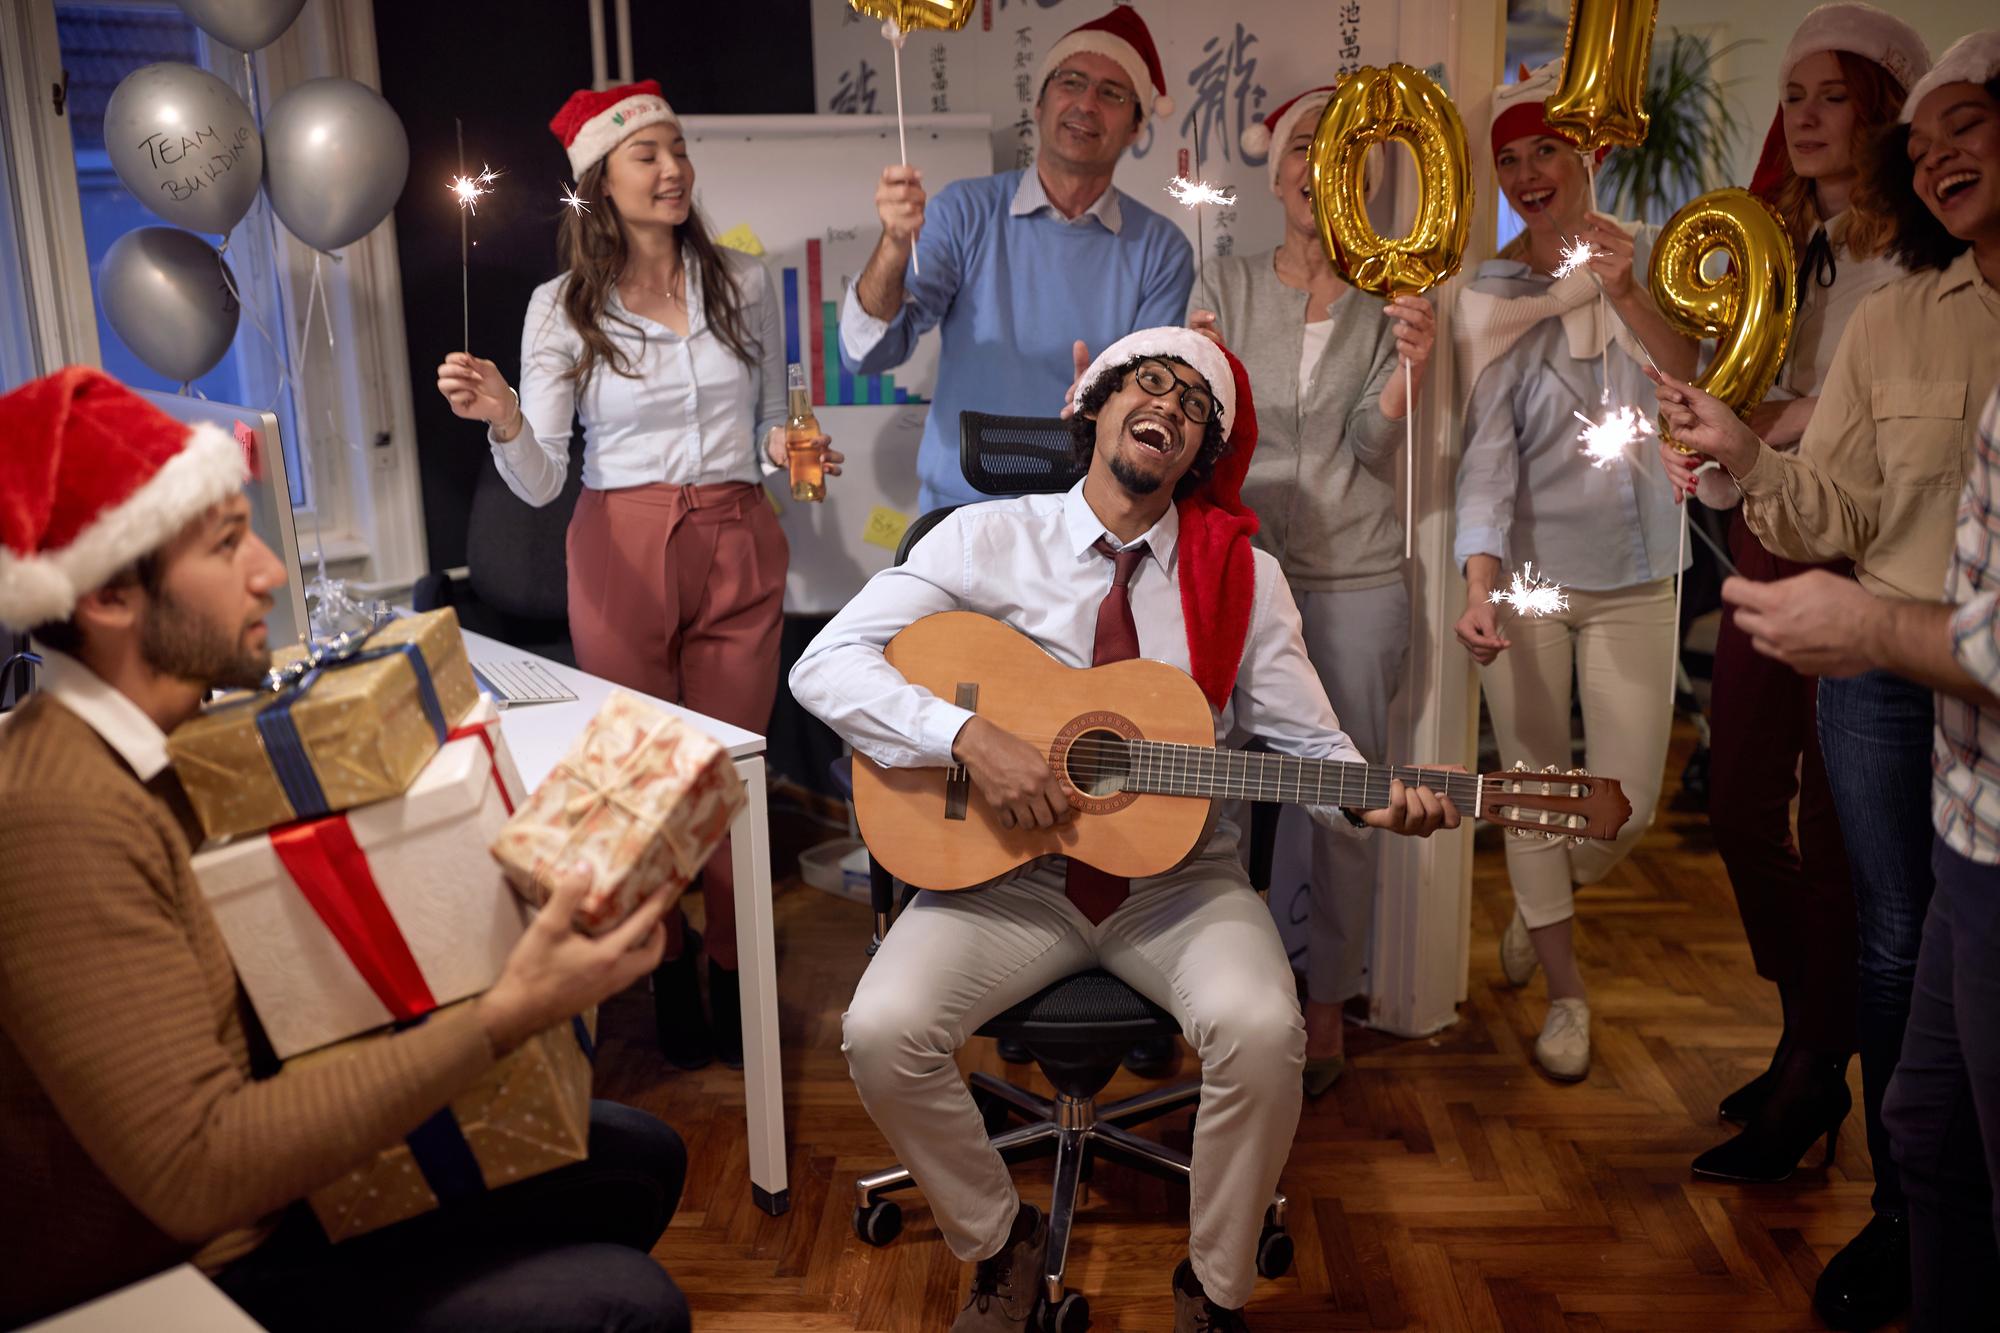 fiesta de empresa de Navidad